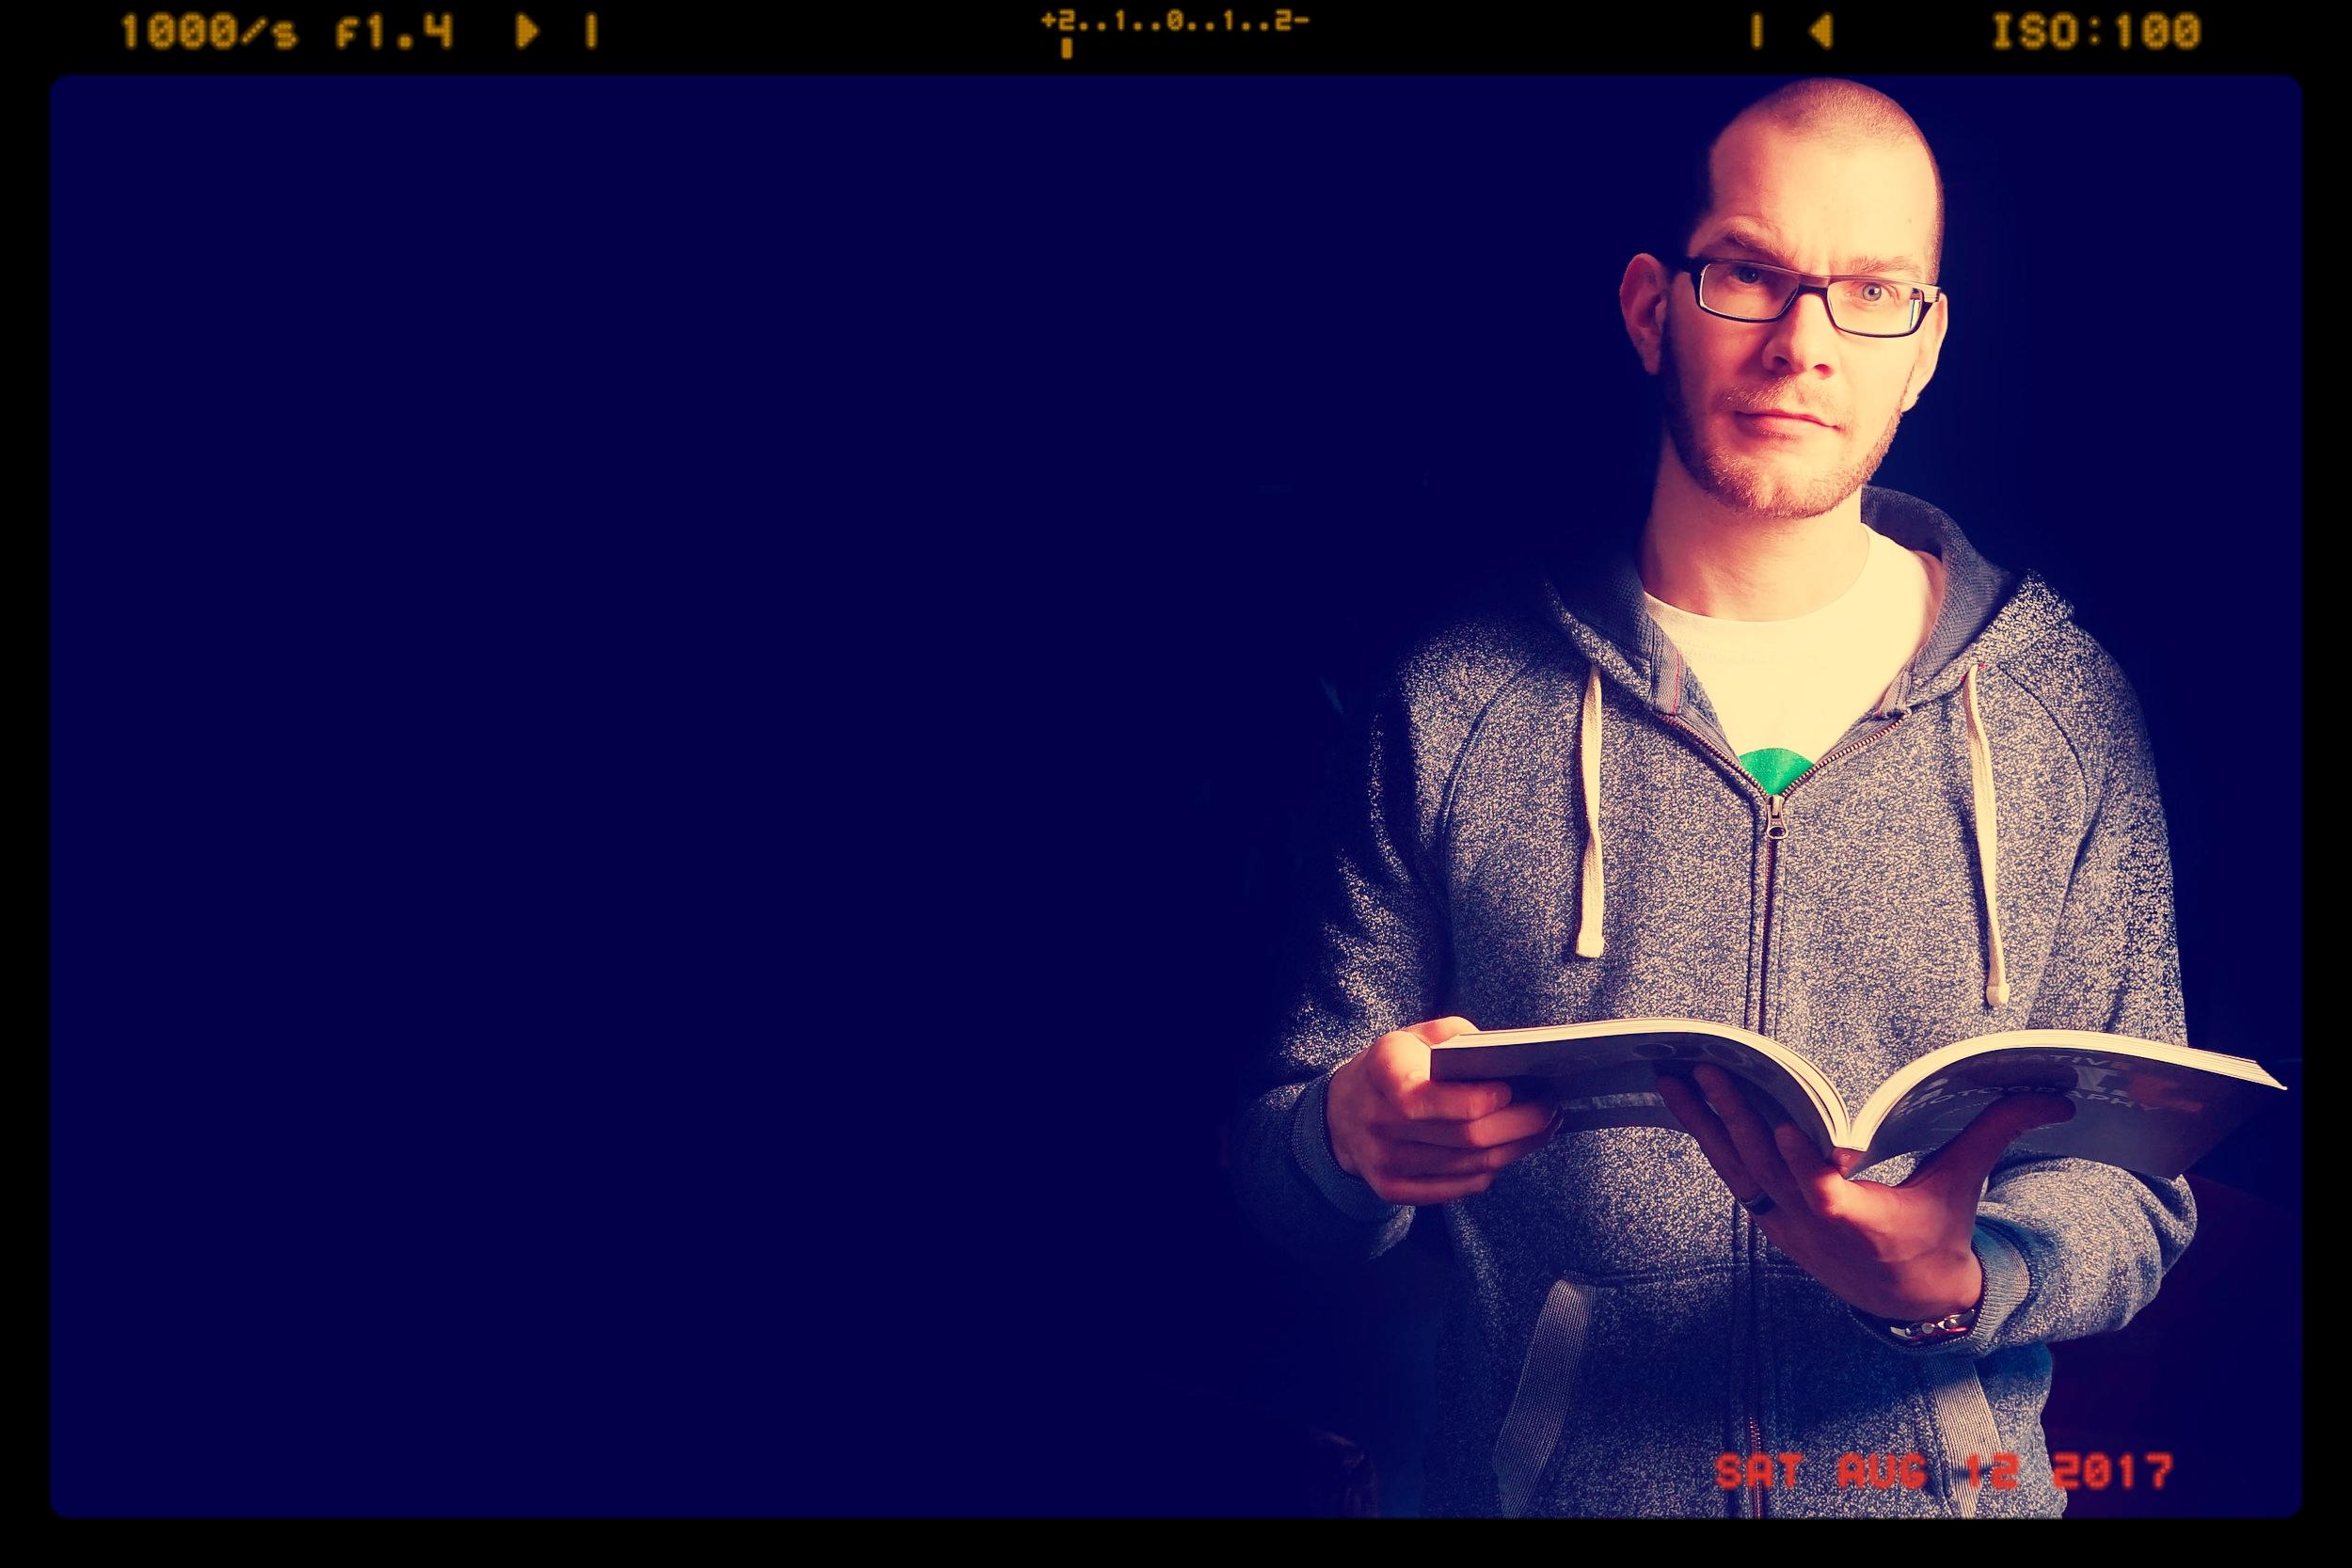 Haje Jan KampsCo-Founder and CEO, LifeFolder - TEACHING A ROBOT ABOUT DEATH